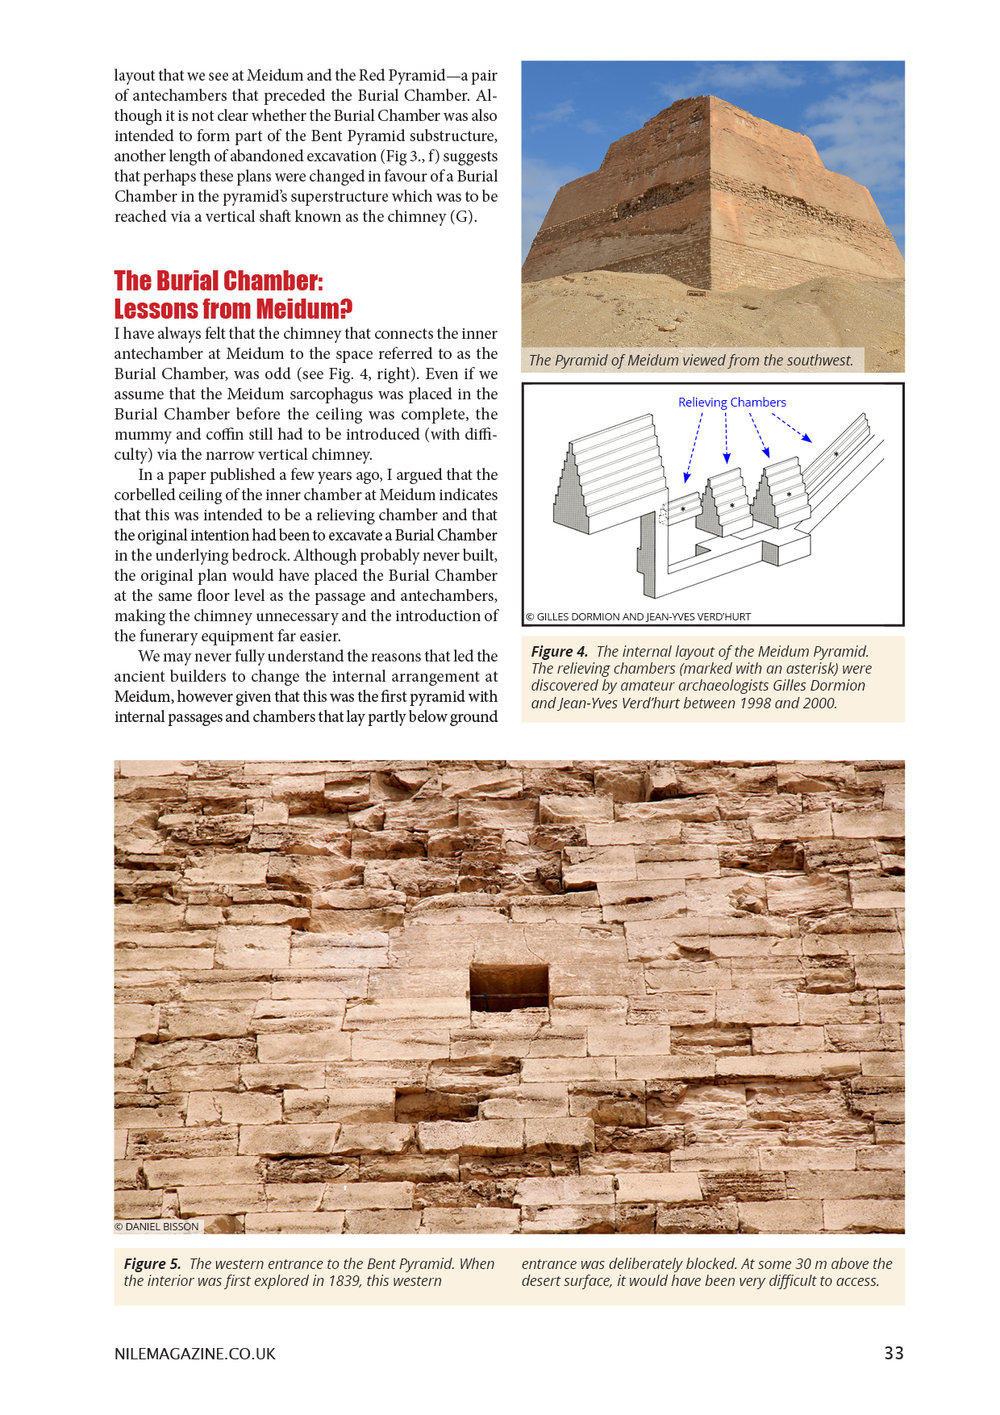 Nile 18, Bent Pyramid 3 1A.jpg